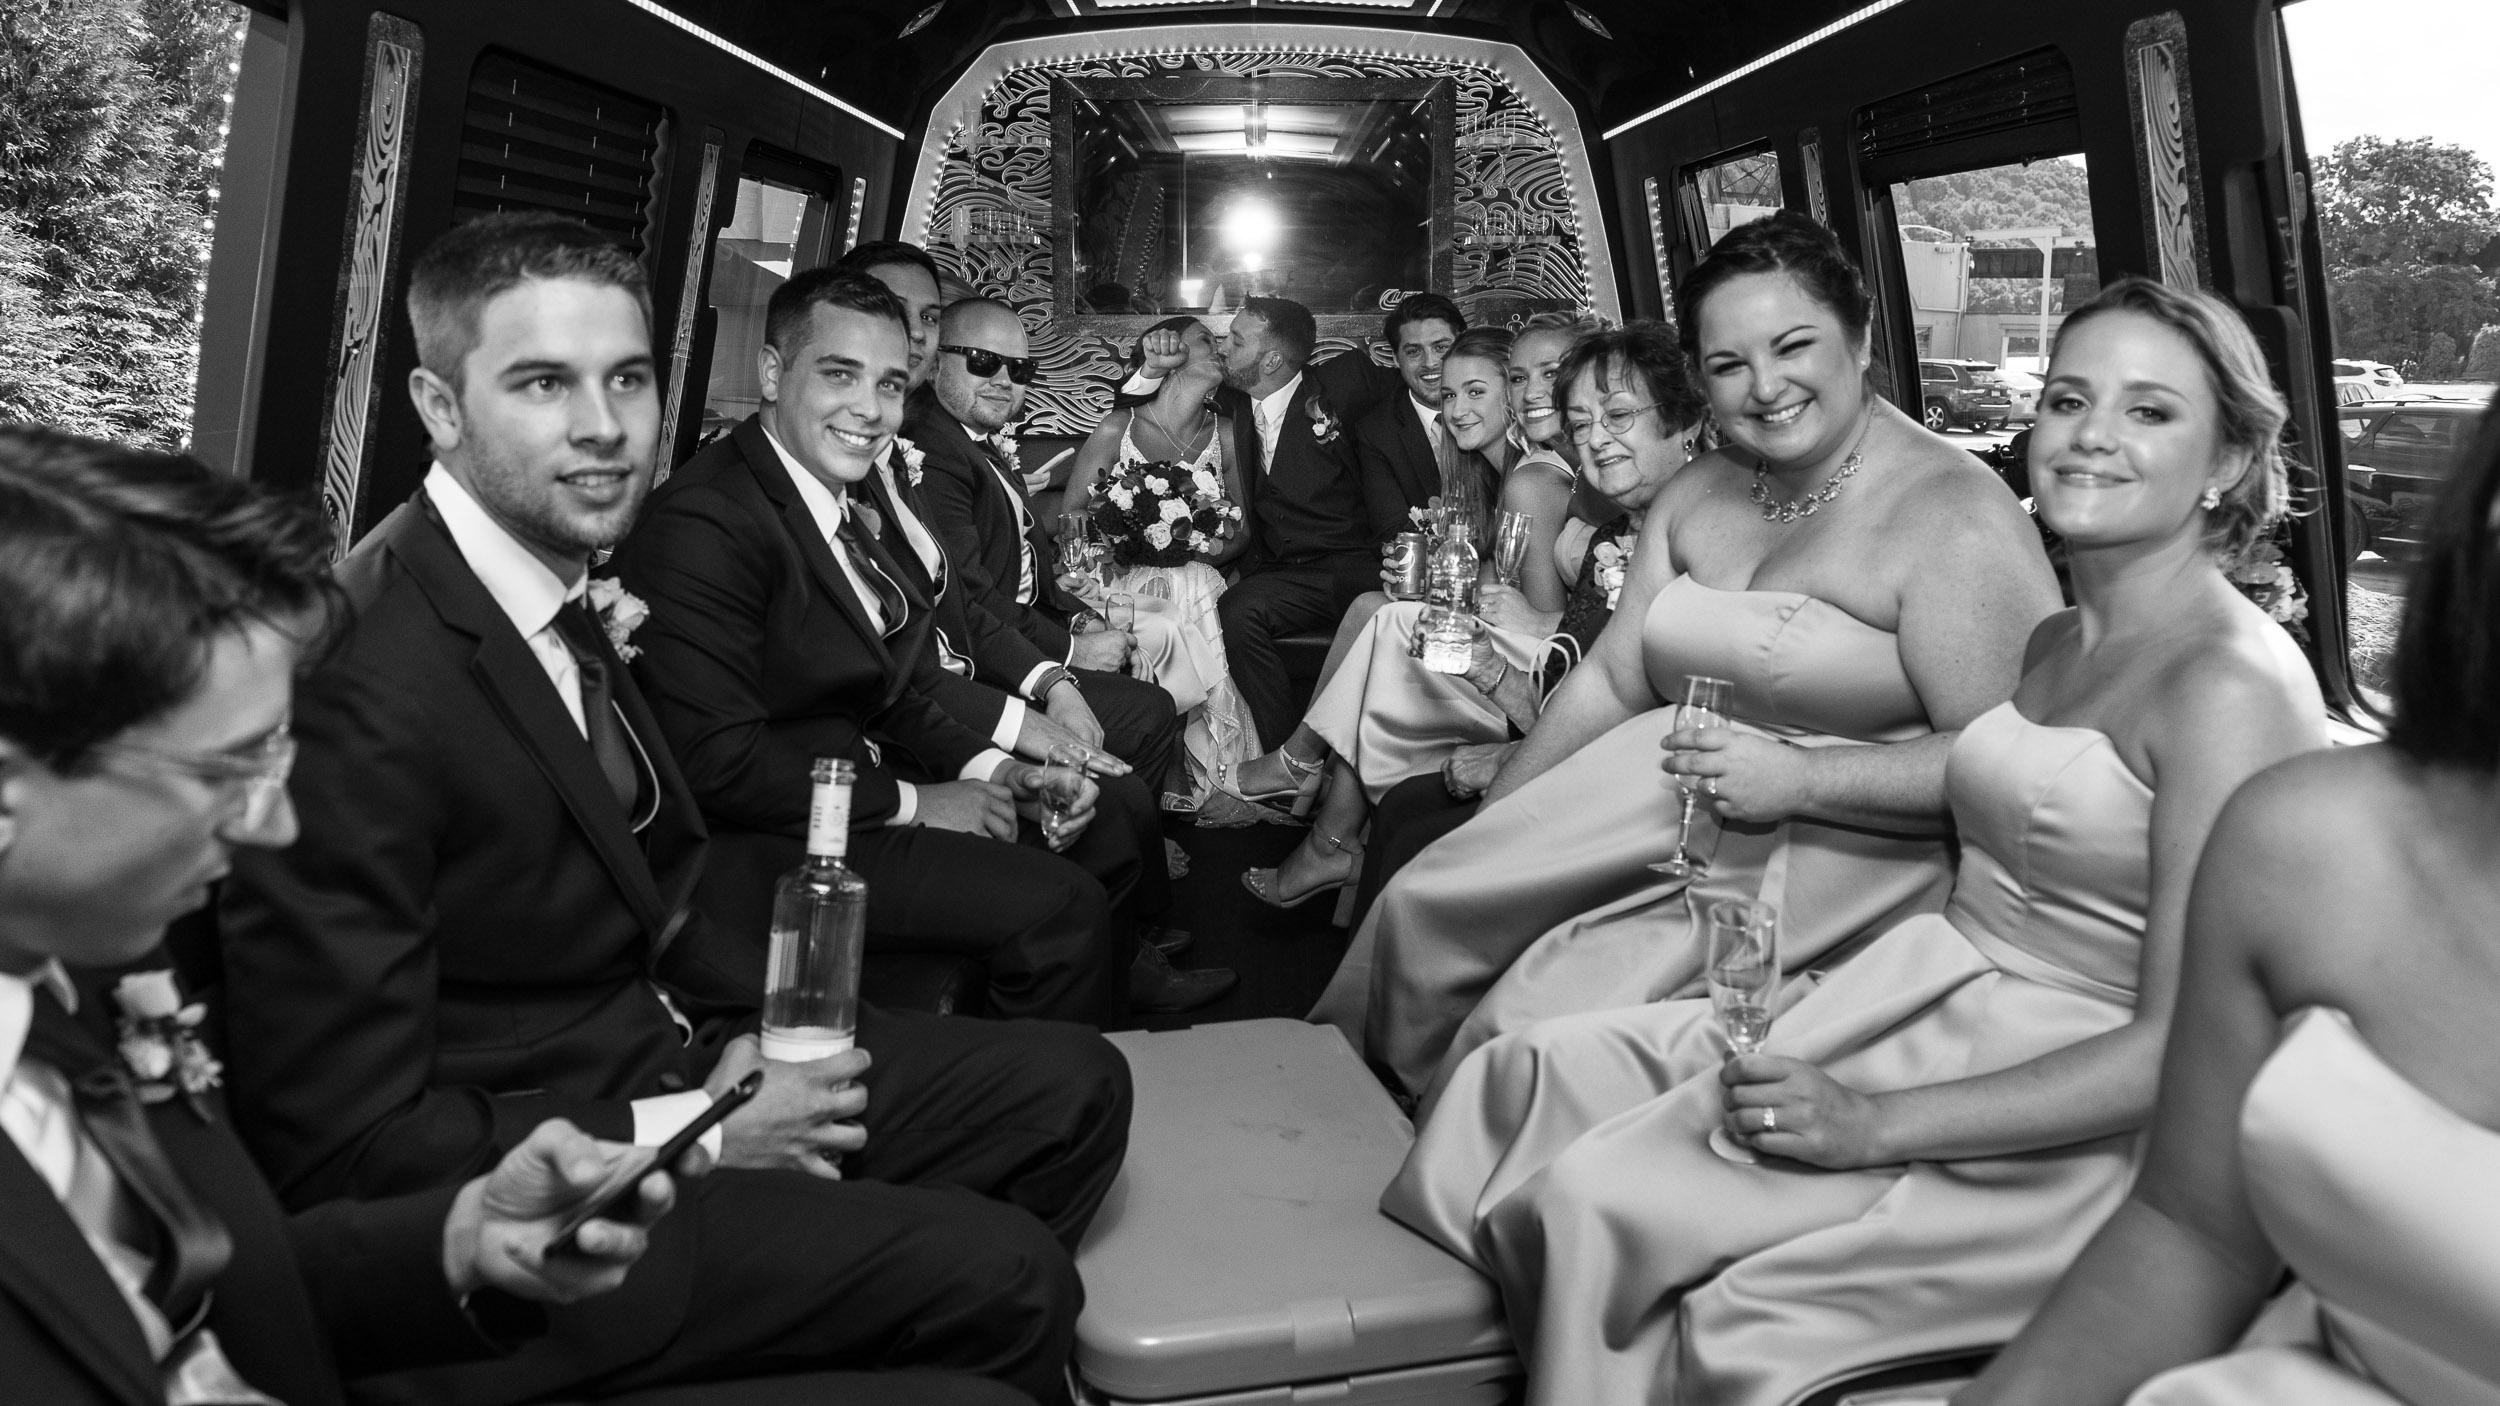 Wedding-Party-Bus-Photography-3.jpg